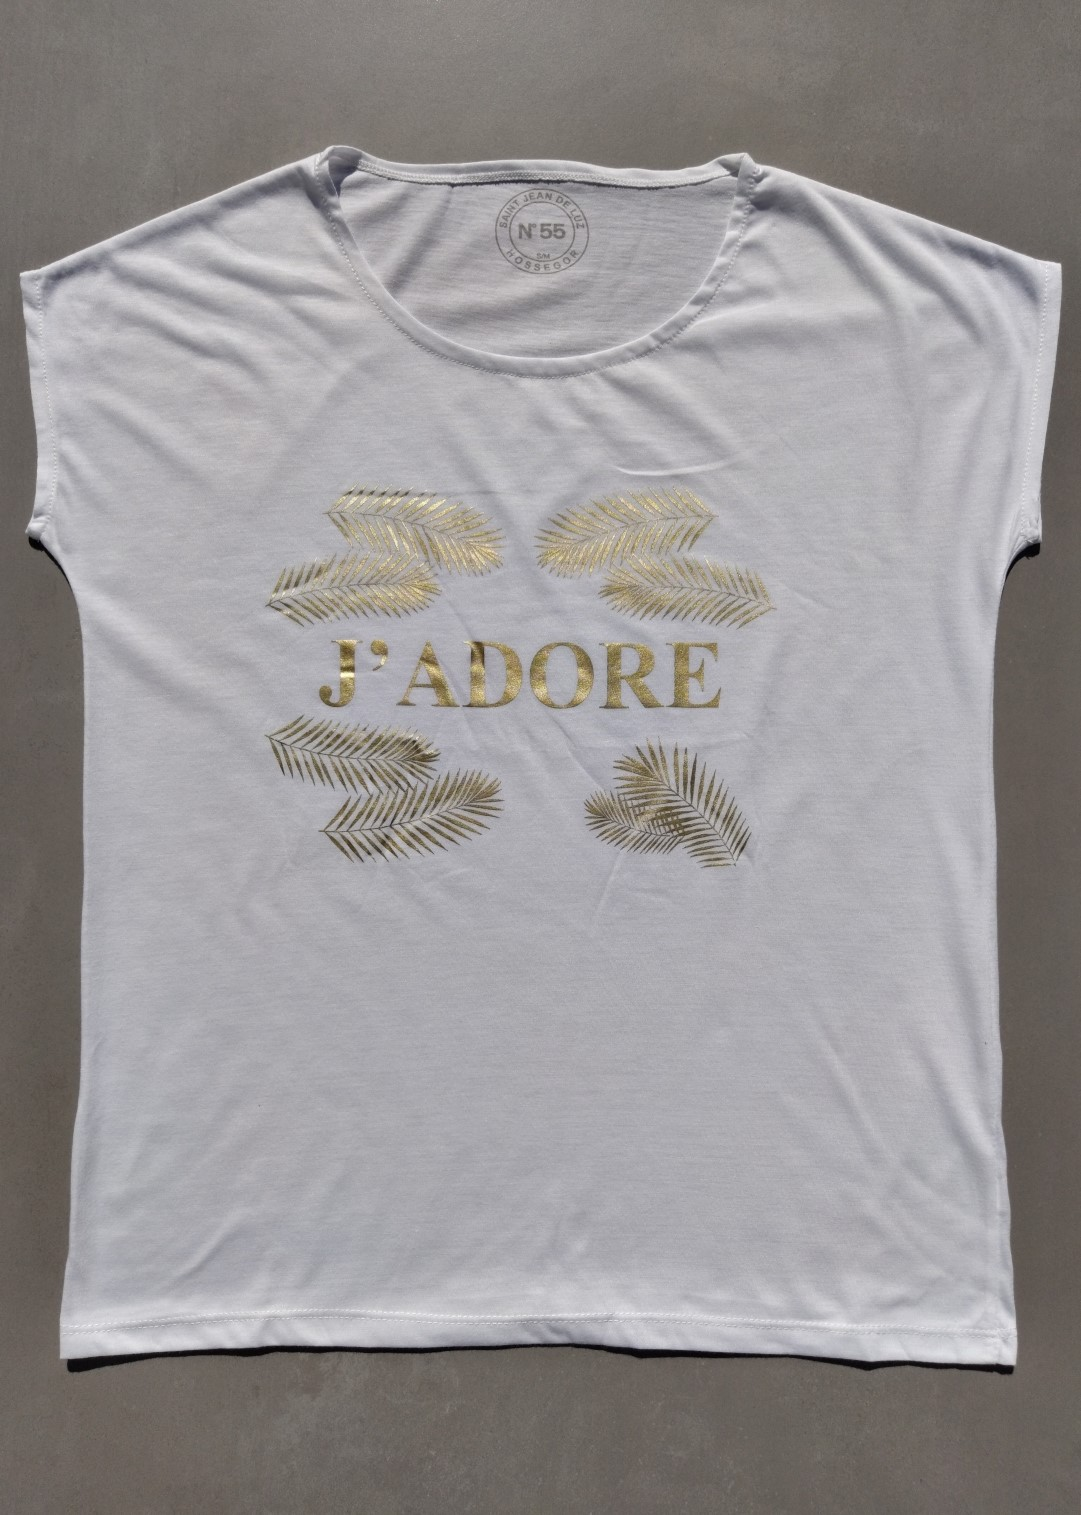 Tee shirt blanc N°55 J'adore.